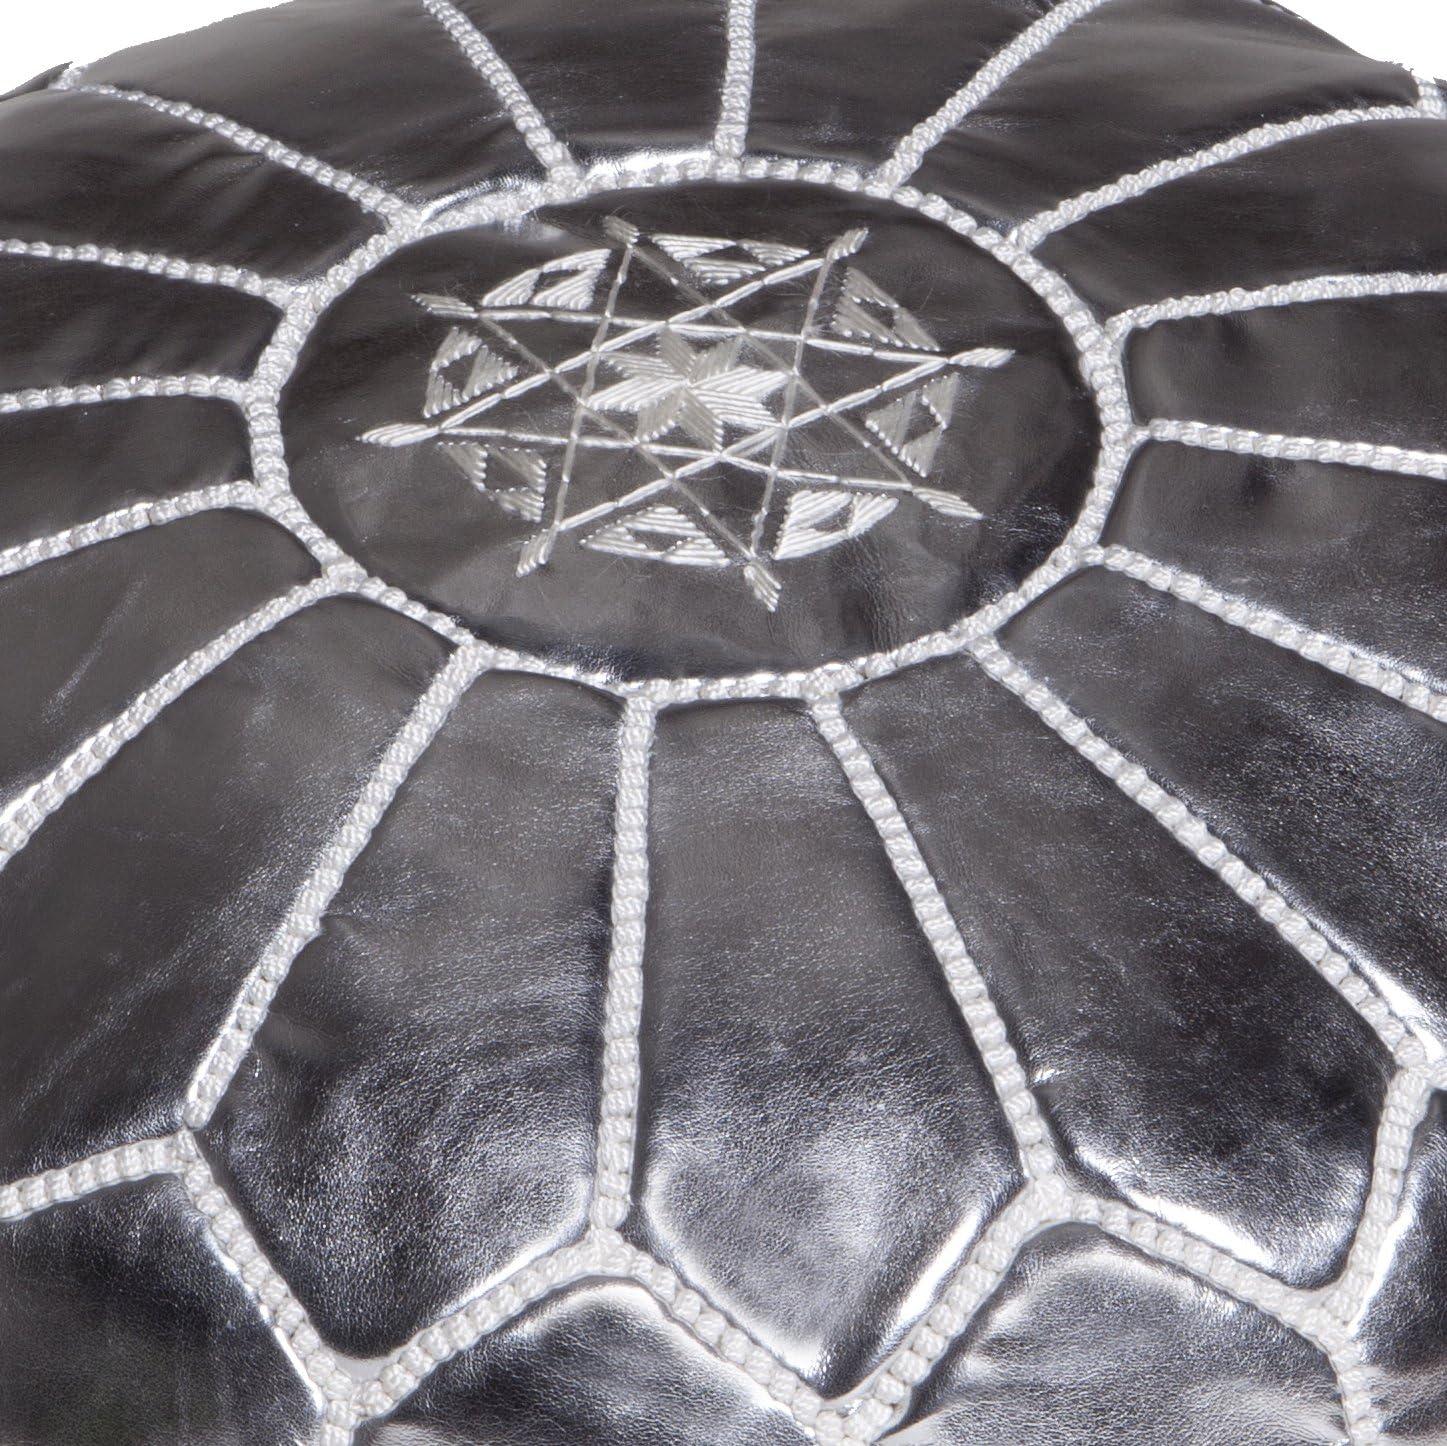 Moroccan Buzz Premium Faux Leather Pouf Ottoman Cover, Silver UNSTUFFED Pouf